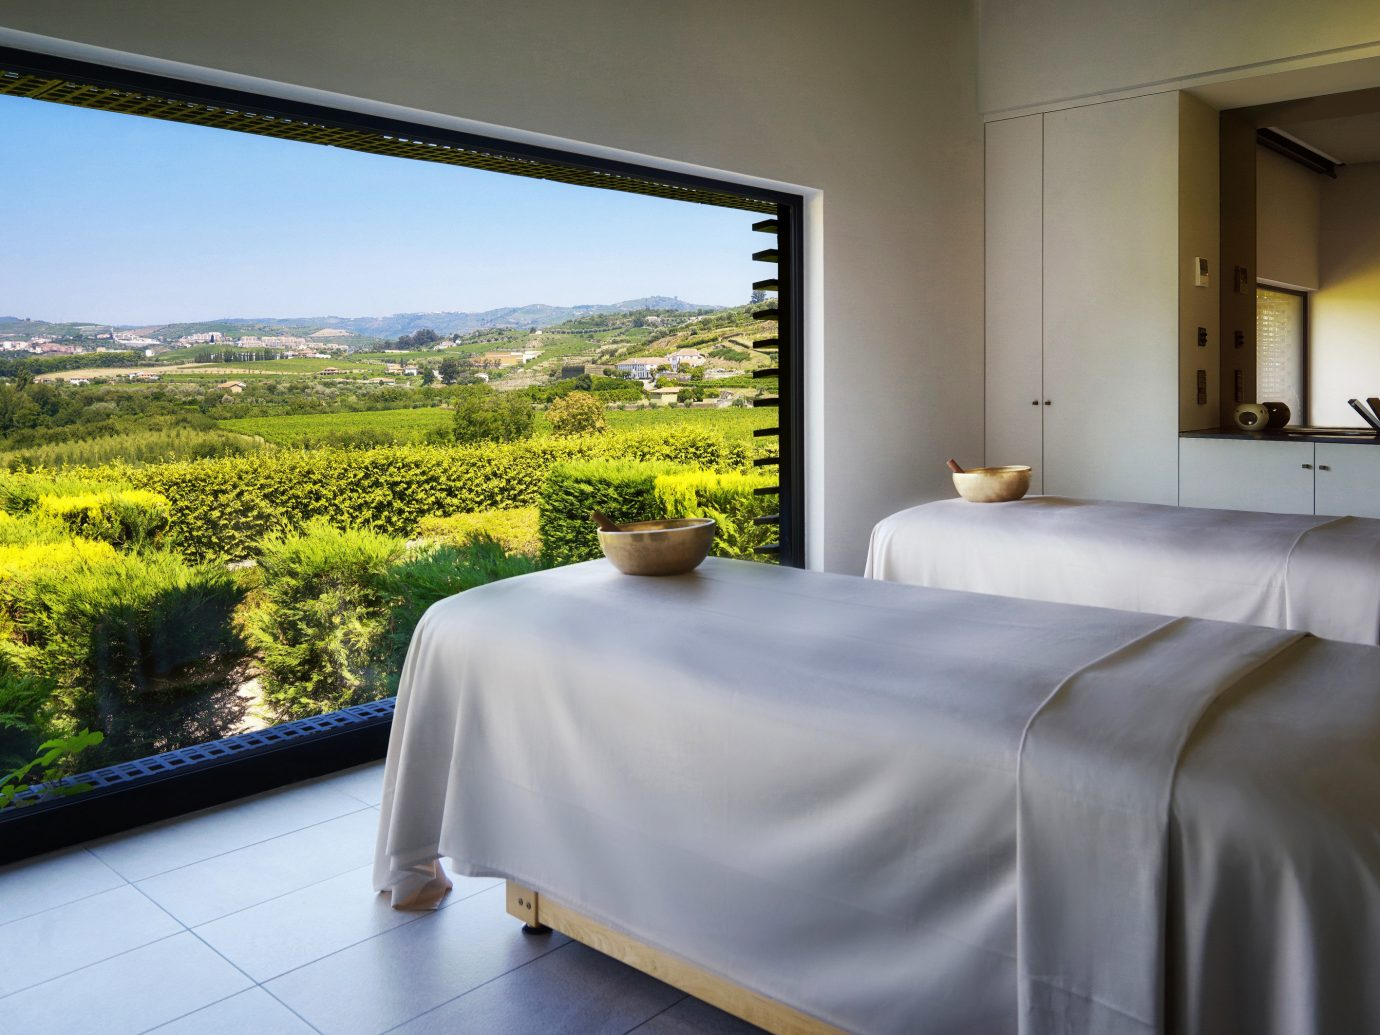 Hotels Spa Trip Ideas indoor bed property room house estate home Villa interior design real estate Suite cottage apartment